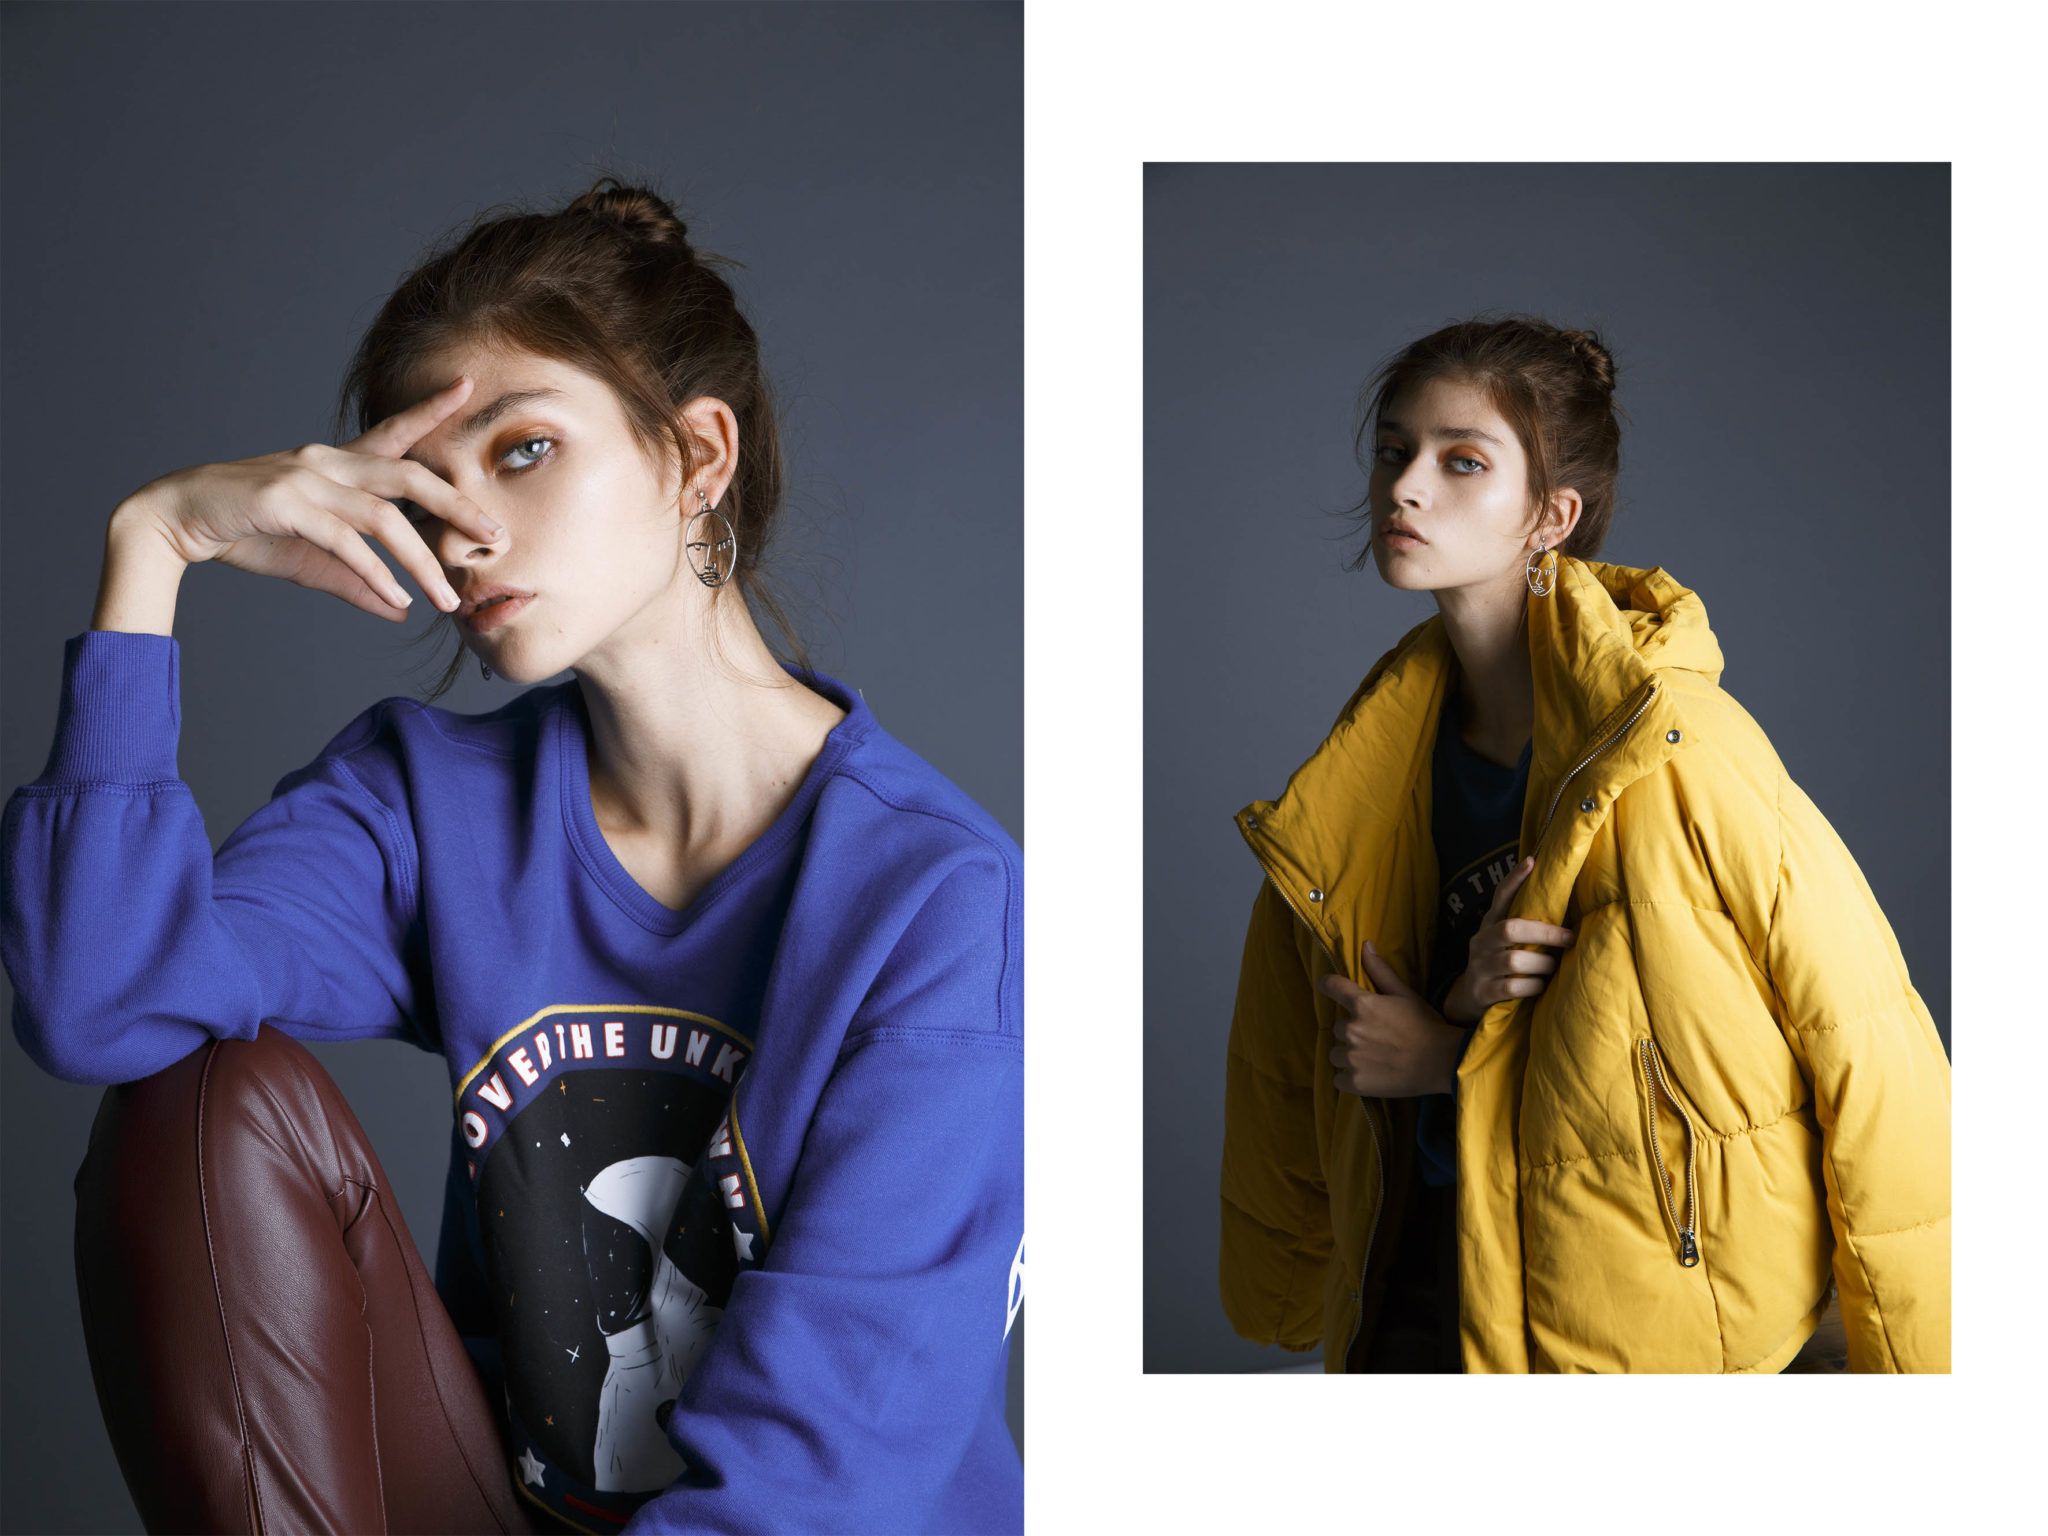 discover the unknown malena fradkin le dernier etage magazine editorial fashion story magazine webditorial